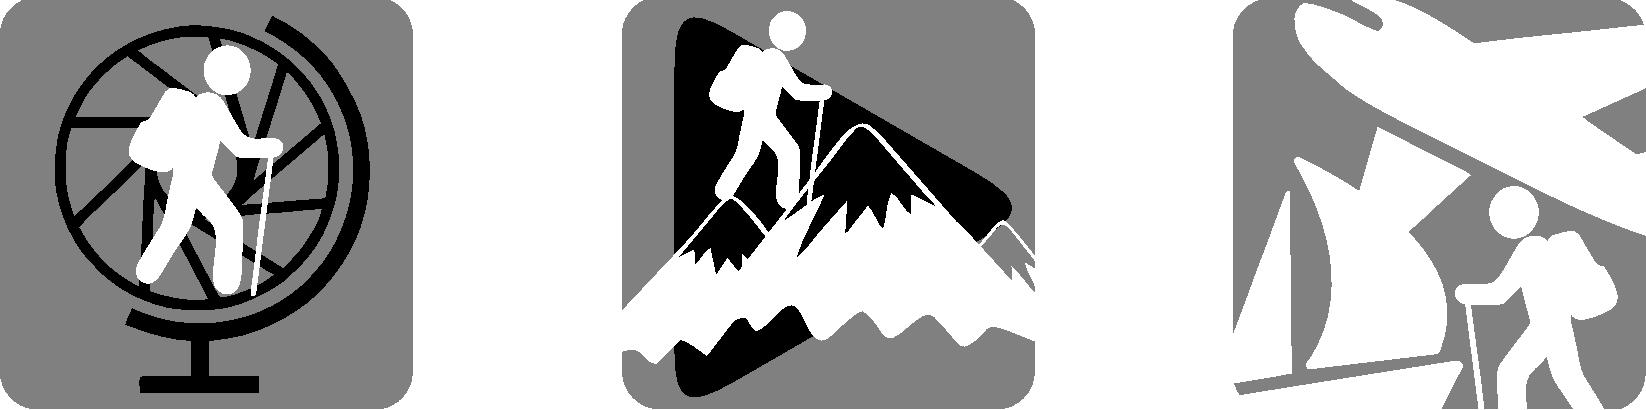 Разработка логотипа и иконки для Travel Video Platform фото f_9245c37ef2421e79.jpg